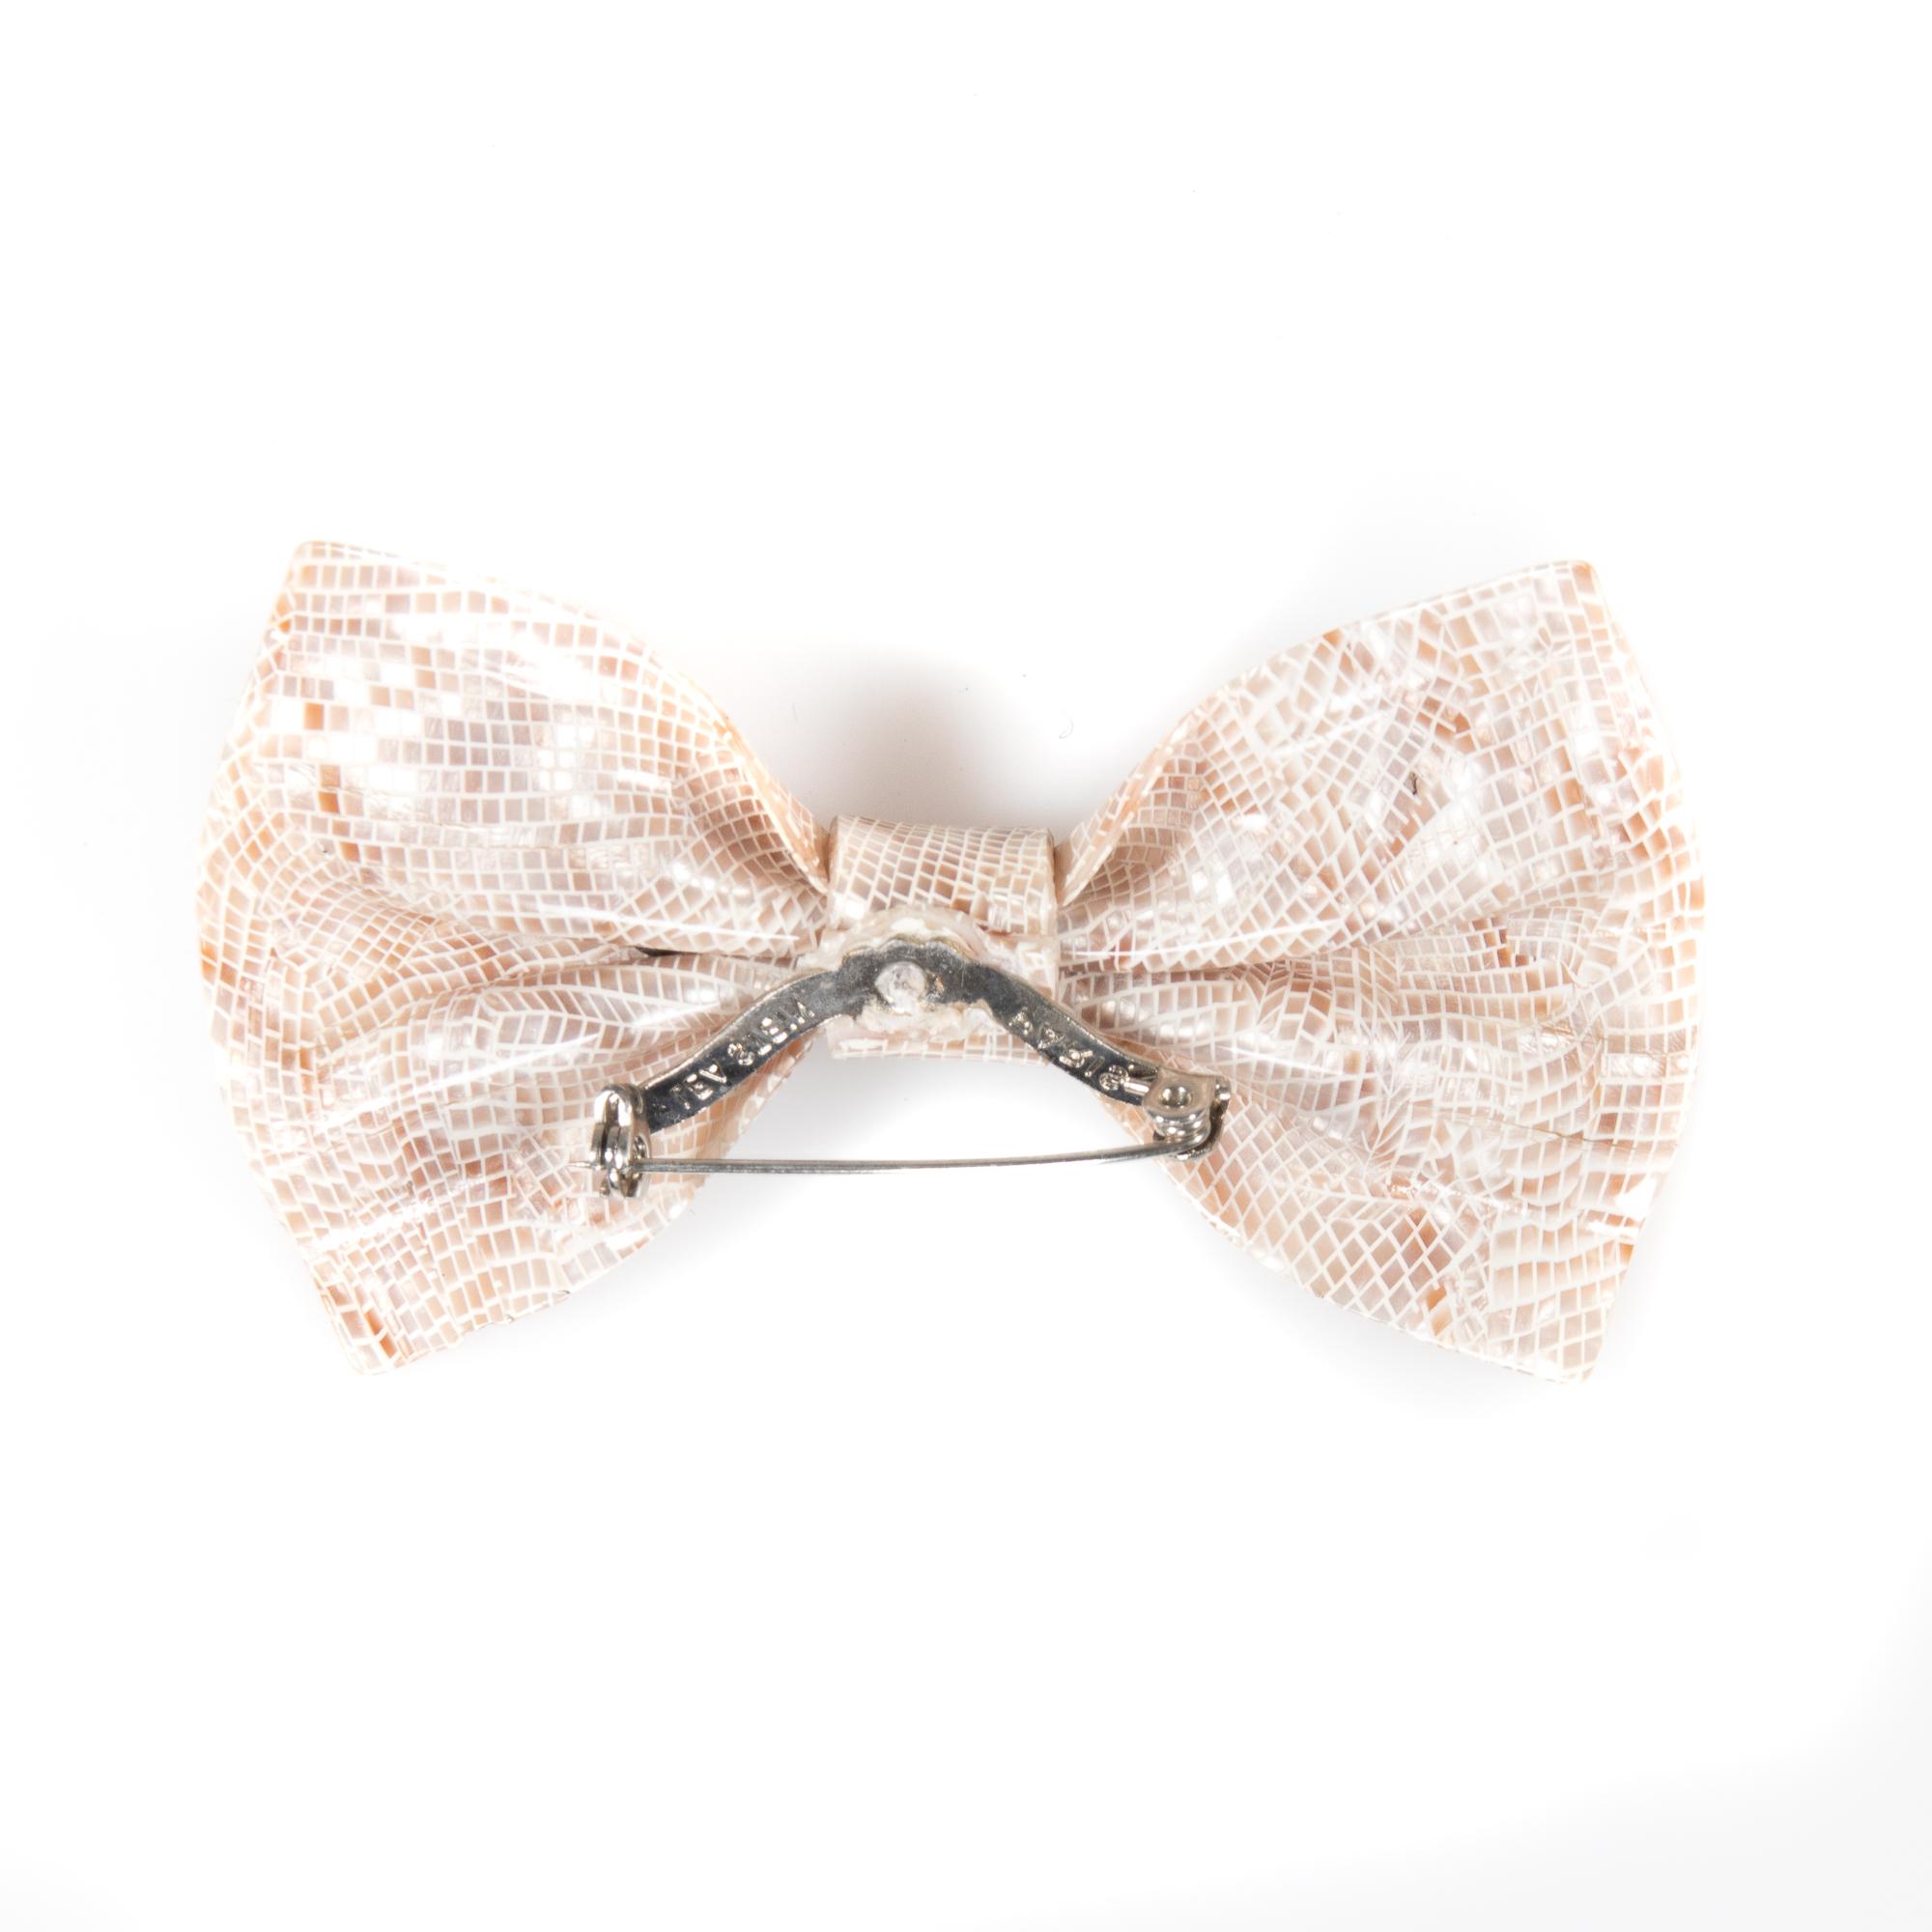 Lea Stein Signed Paris Bakelite Designer Brooch - Image 5 of 6